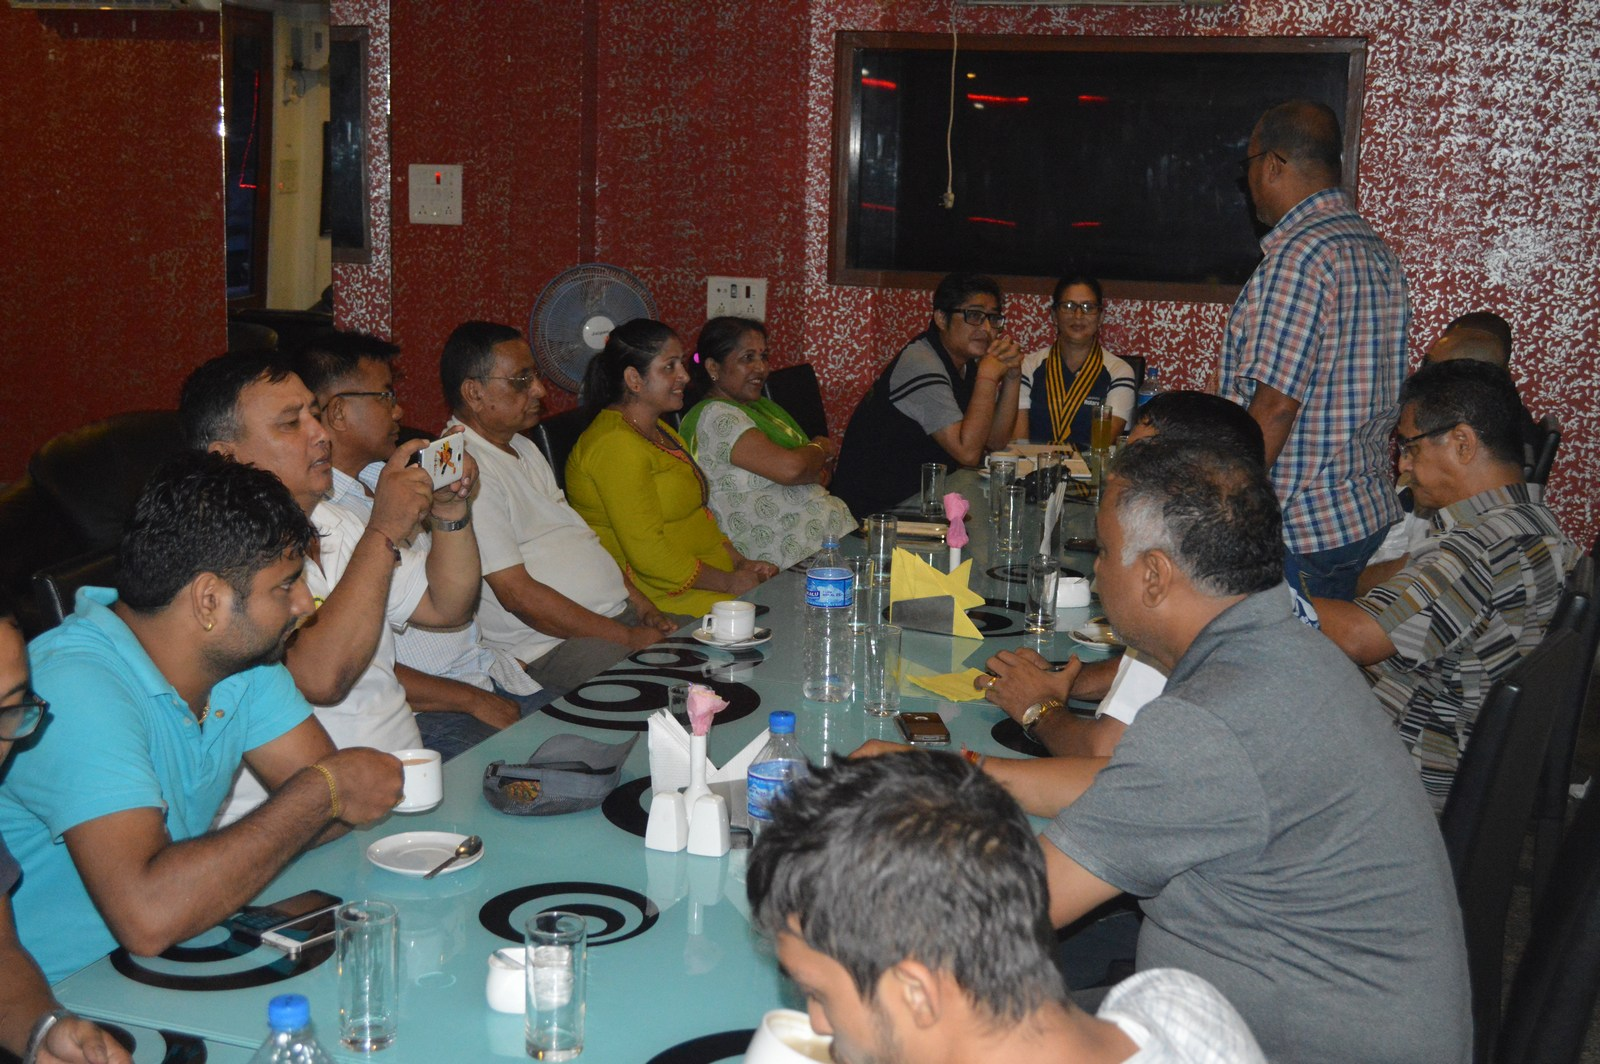 Weekly-Meeting-with-the-Guest-Speaker-DSP-Durga-Raj-Regmi-Rotary-Club-of-Kakarvitta-7